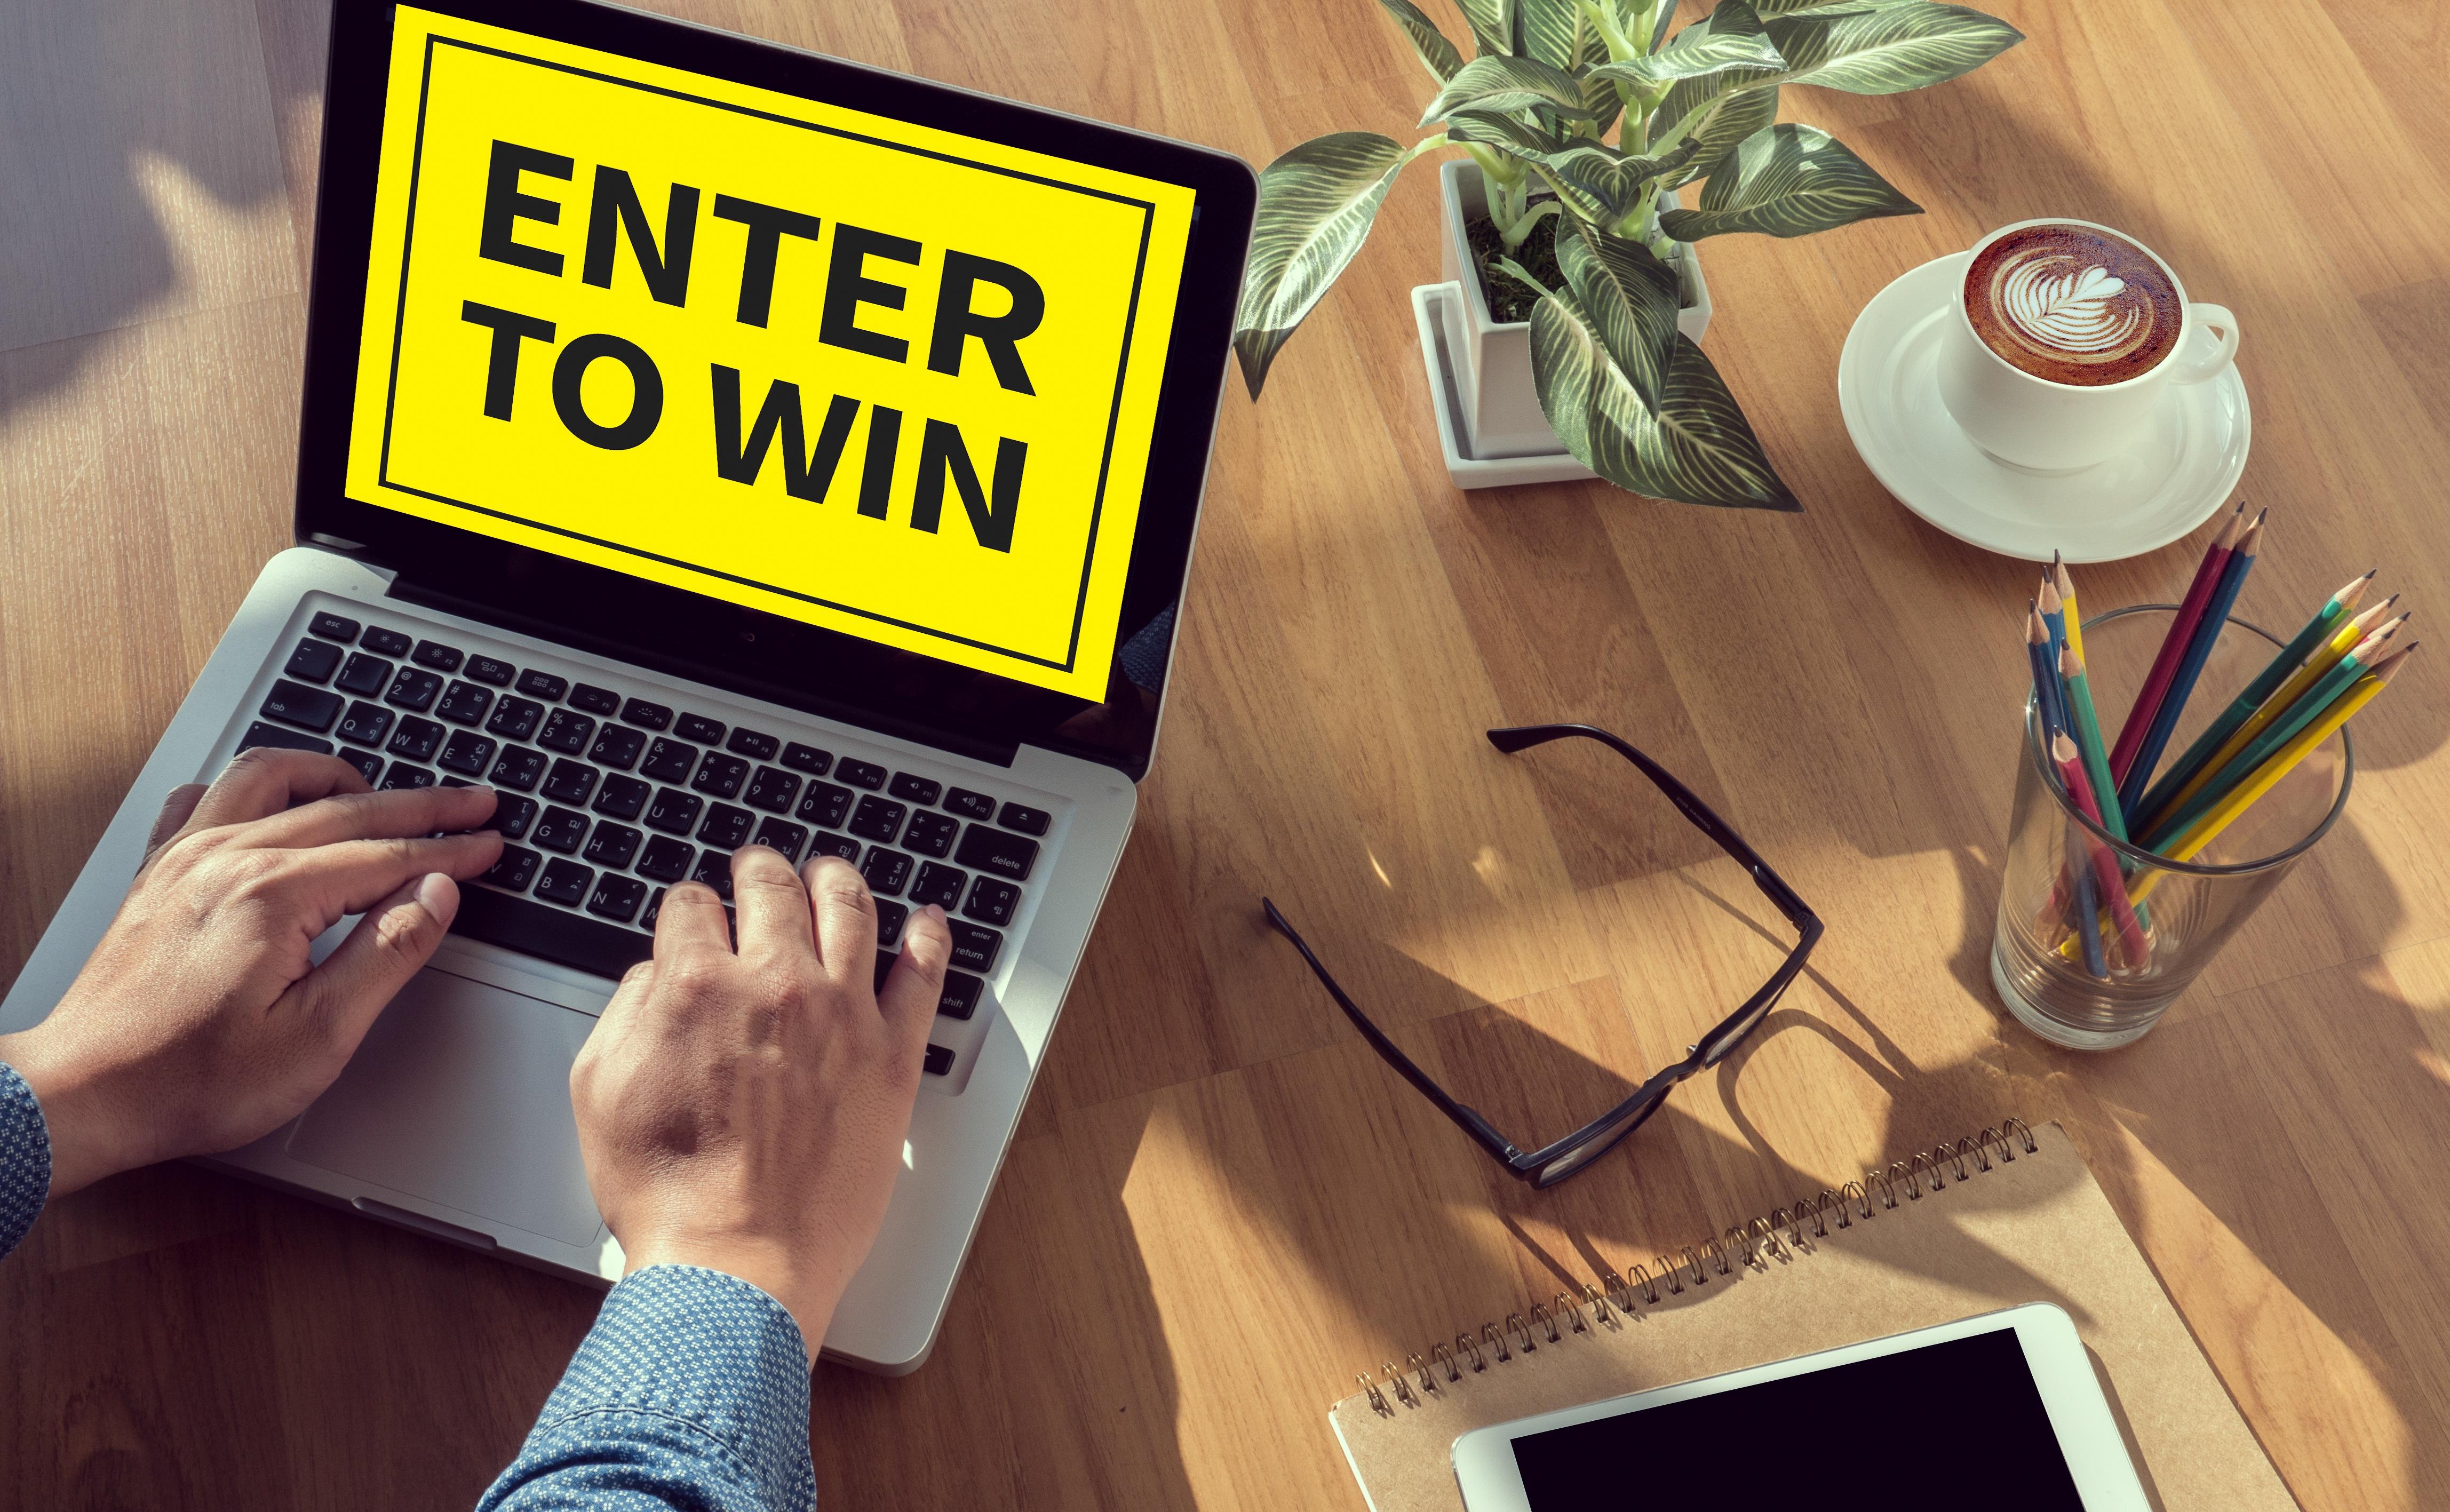 bigstock-Enter-To-Win-141845117